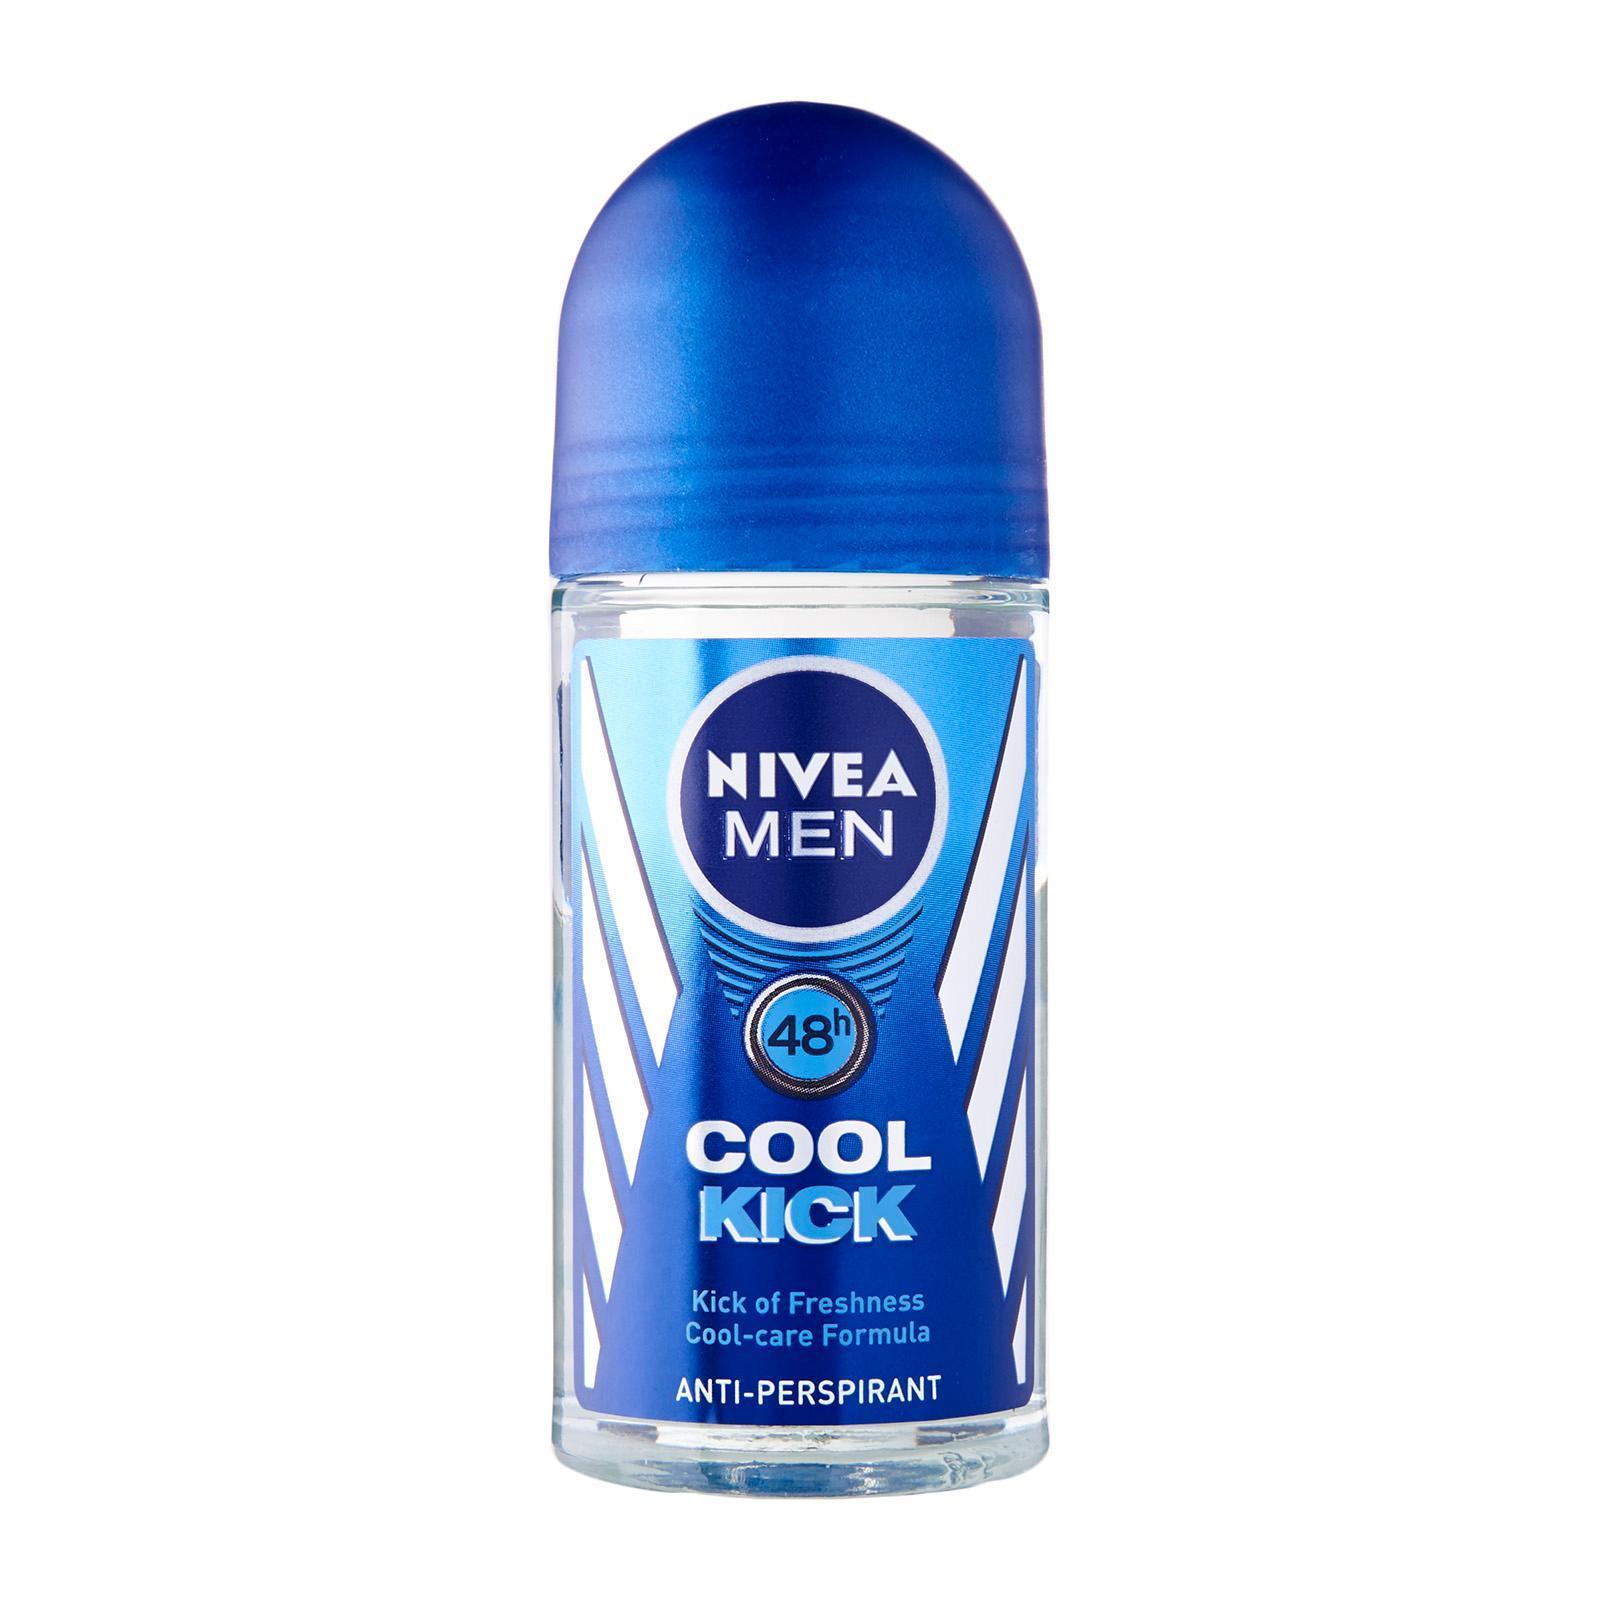 Nivea for Men Cool Kick Anti-Perspirant Roll-On